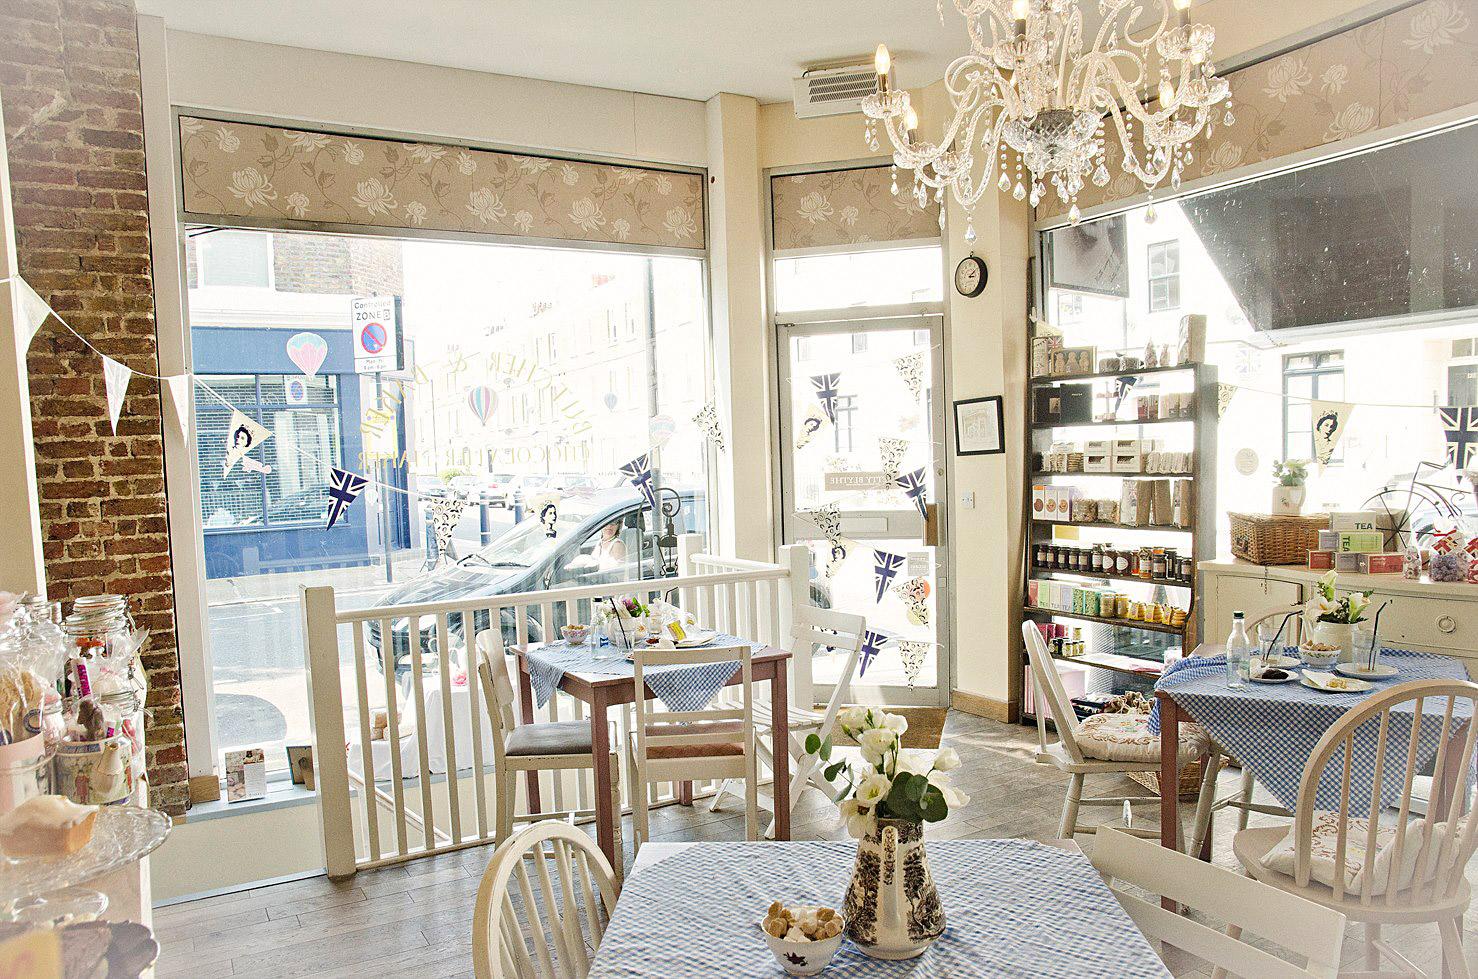 tea shop Novelteas tea shop, hastings: see 16 unbiased reviews of novelteas tea  shop, rated 45 of 5 on tripadvisor and ranked #18 of 40 restaurants in hastings.